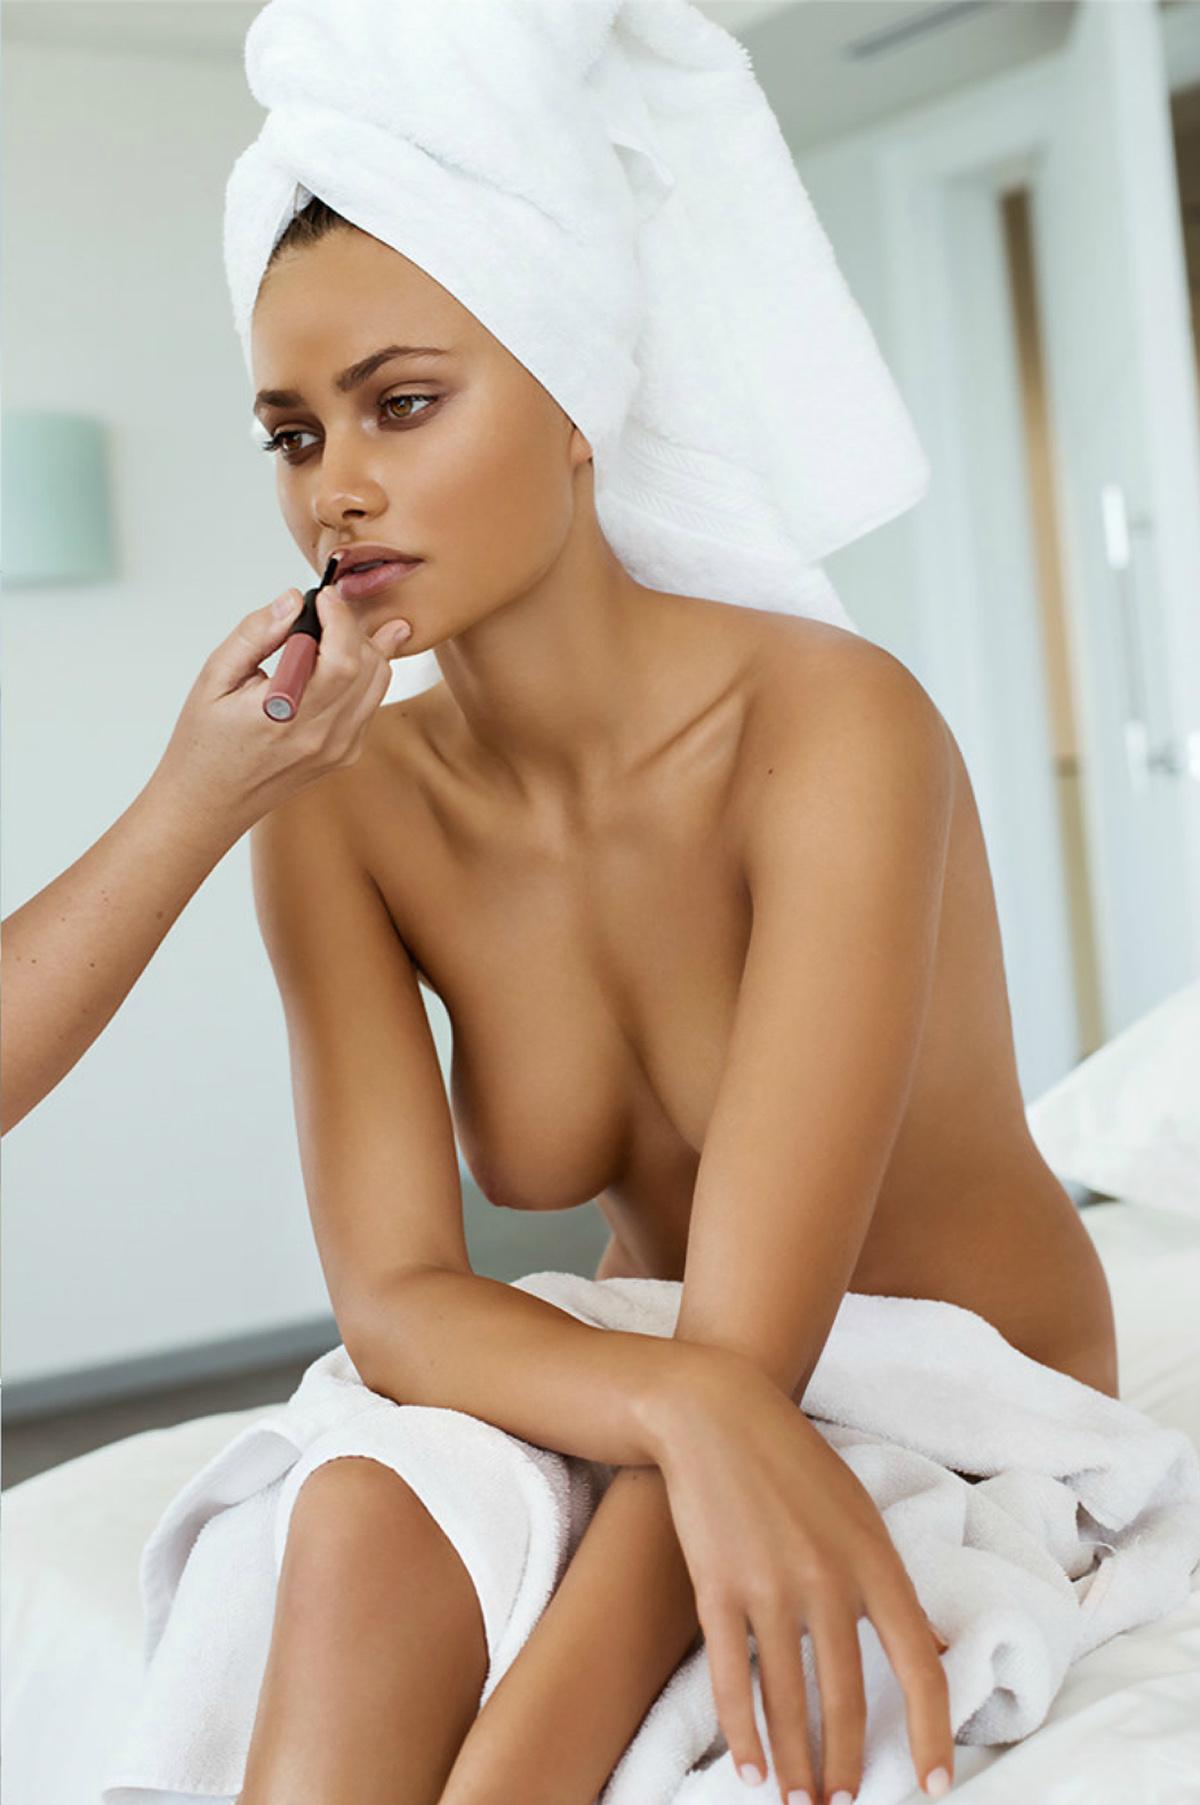 maquillage nue